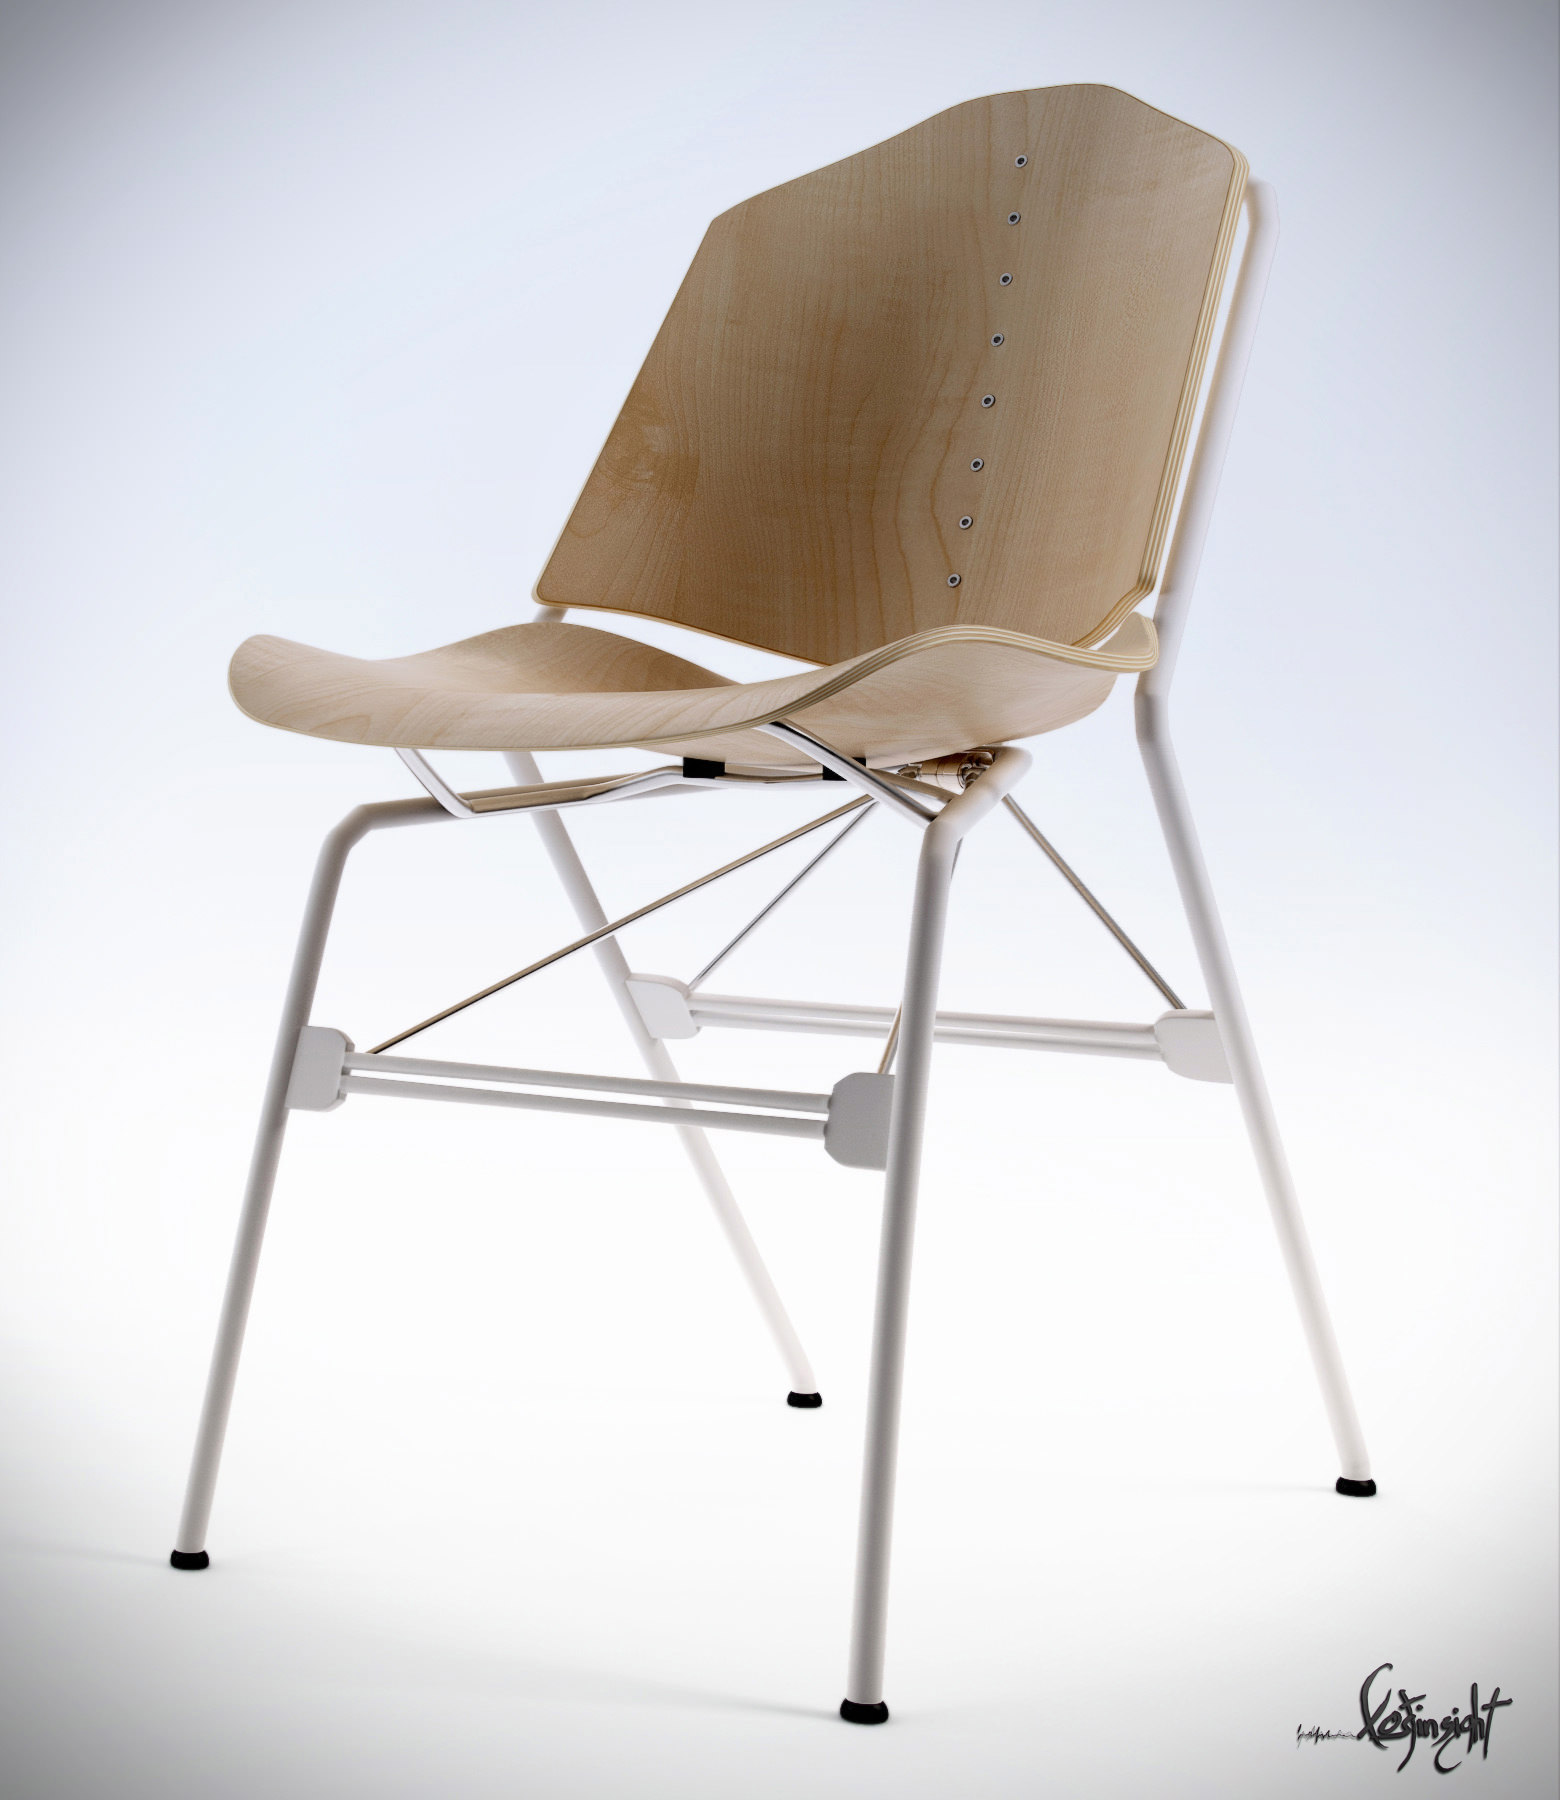 Vert chair free 3d model max for New model chair design